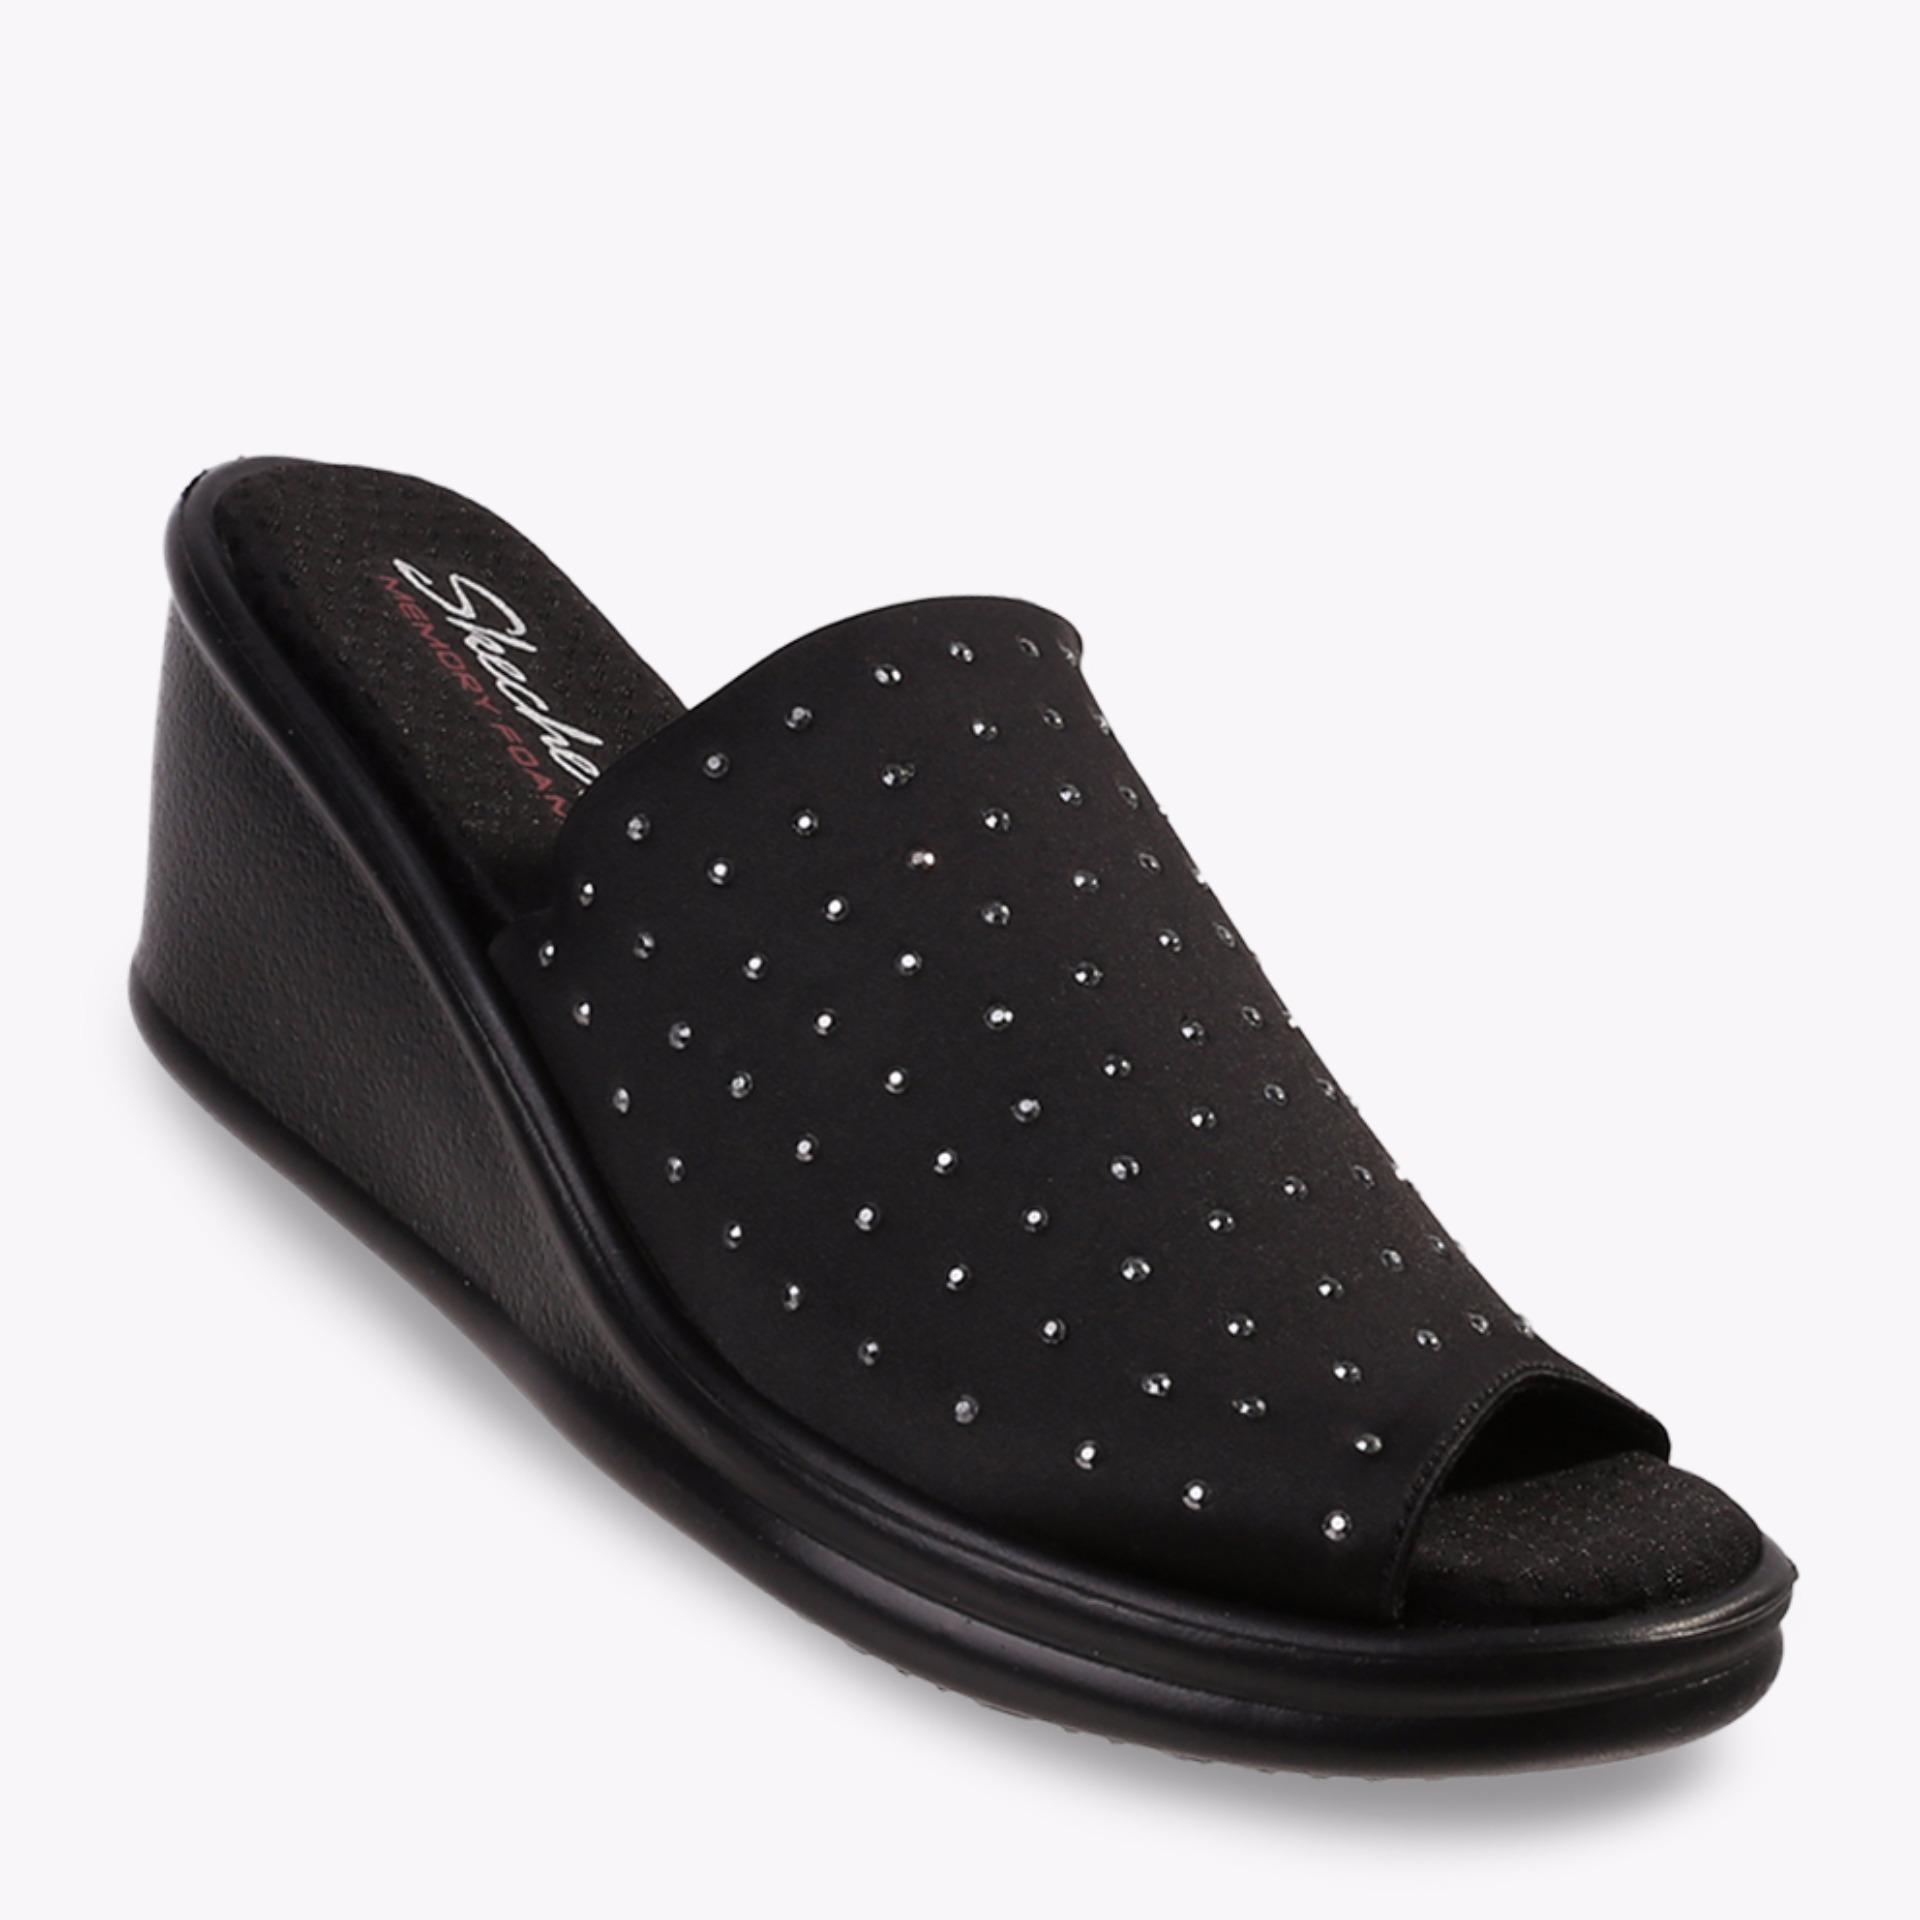 Jual Skechers Rumblers Women S Sandals Hitam Branded Original